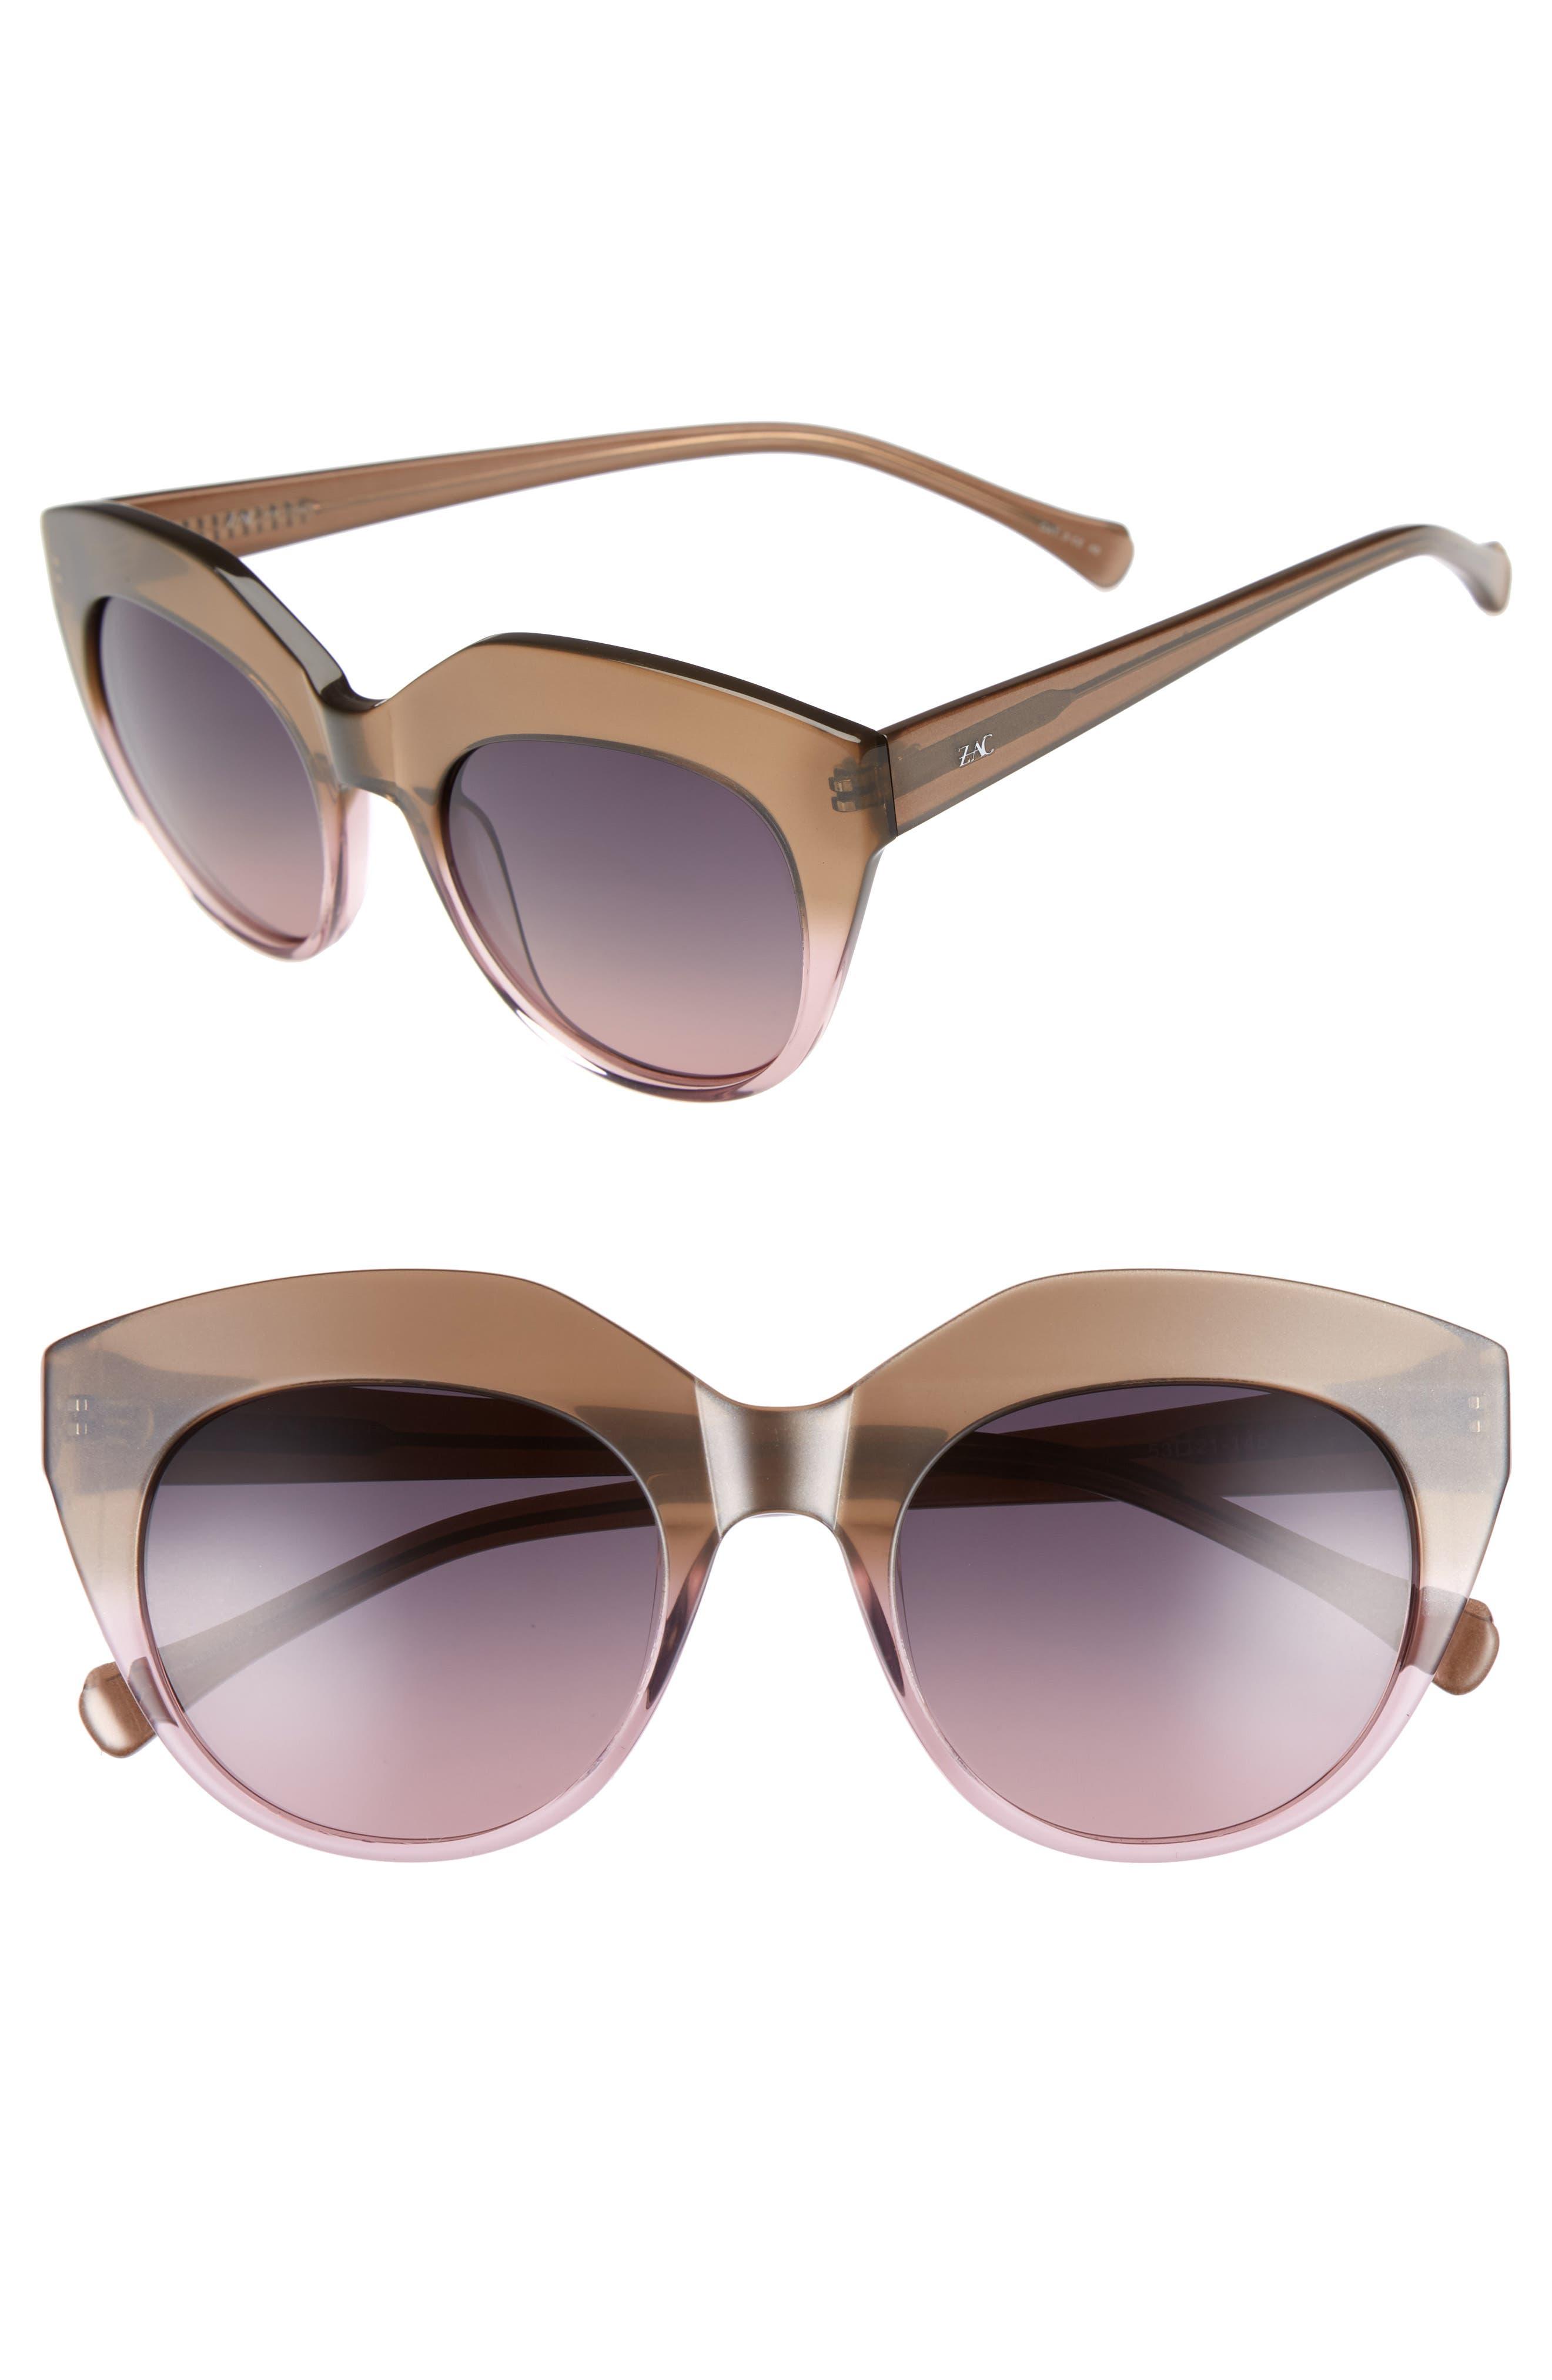 ZAC Zac Posen Tamika 53mm Polarized Sunglasses